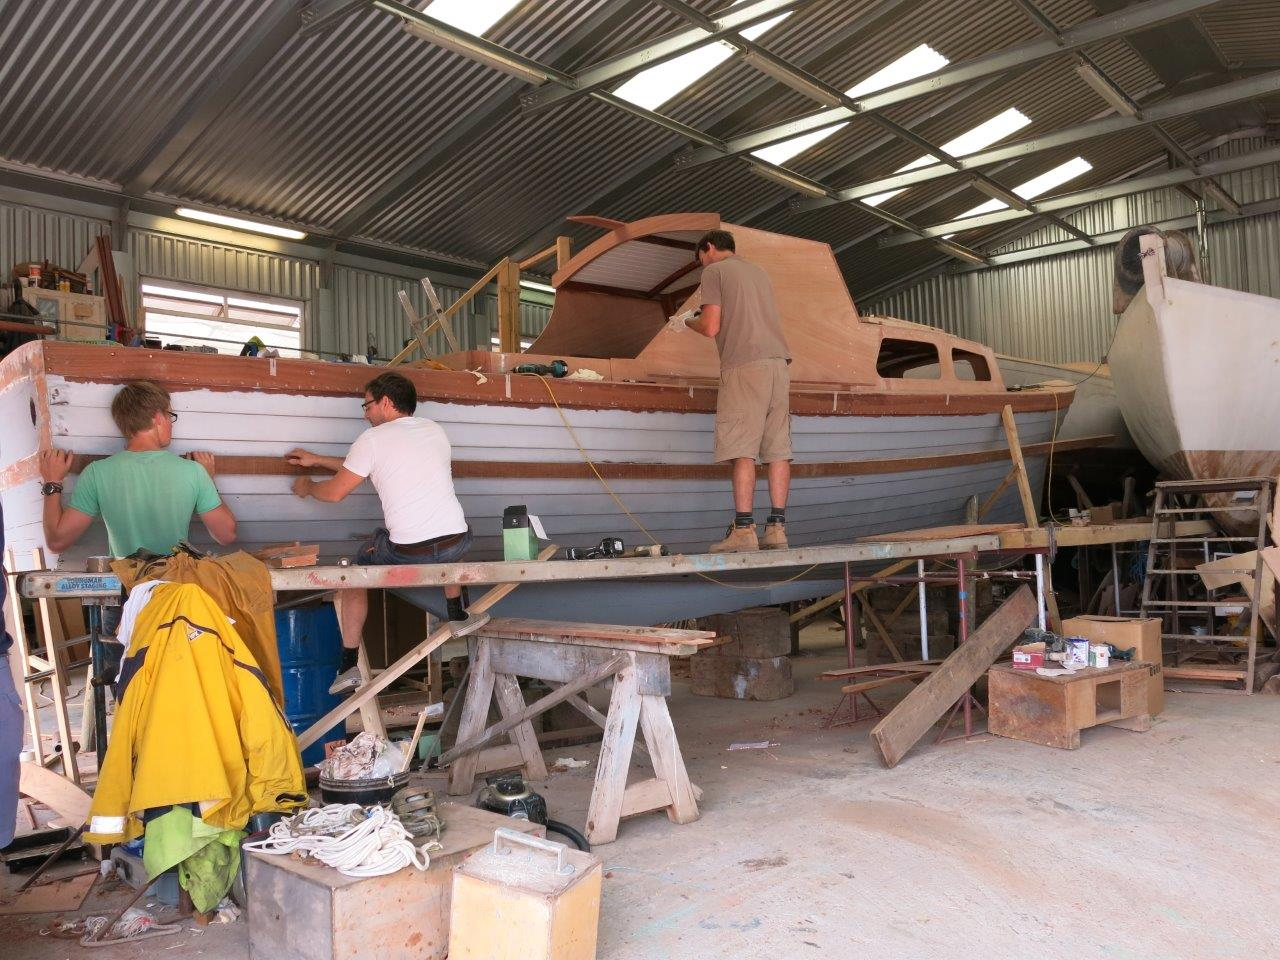 Nigella restoration project team at work